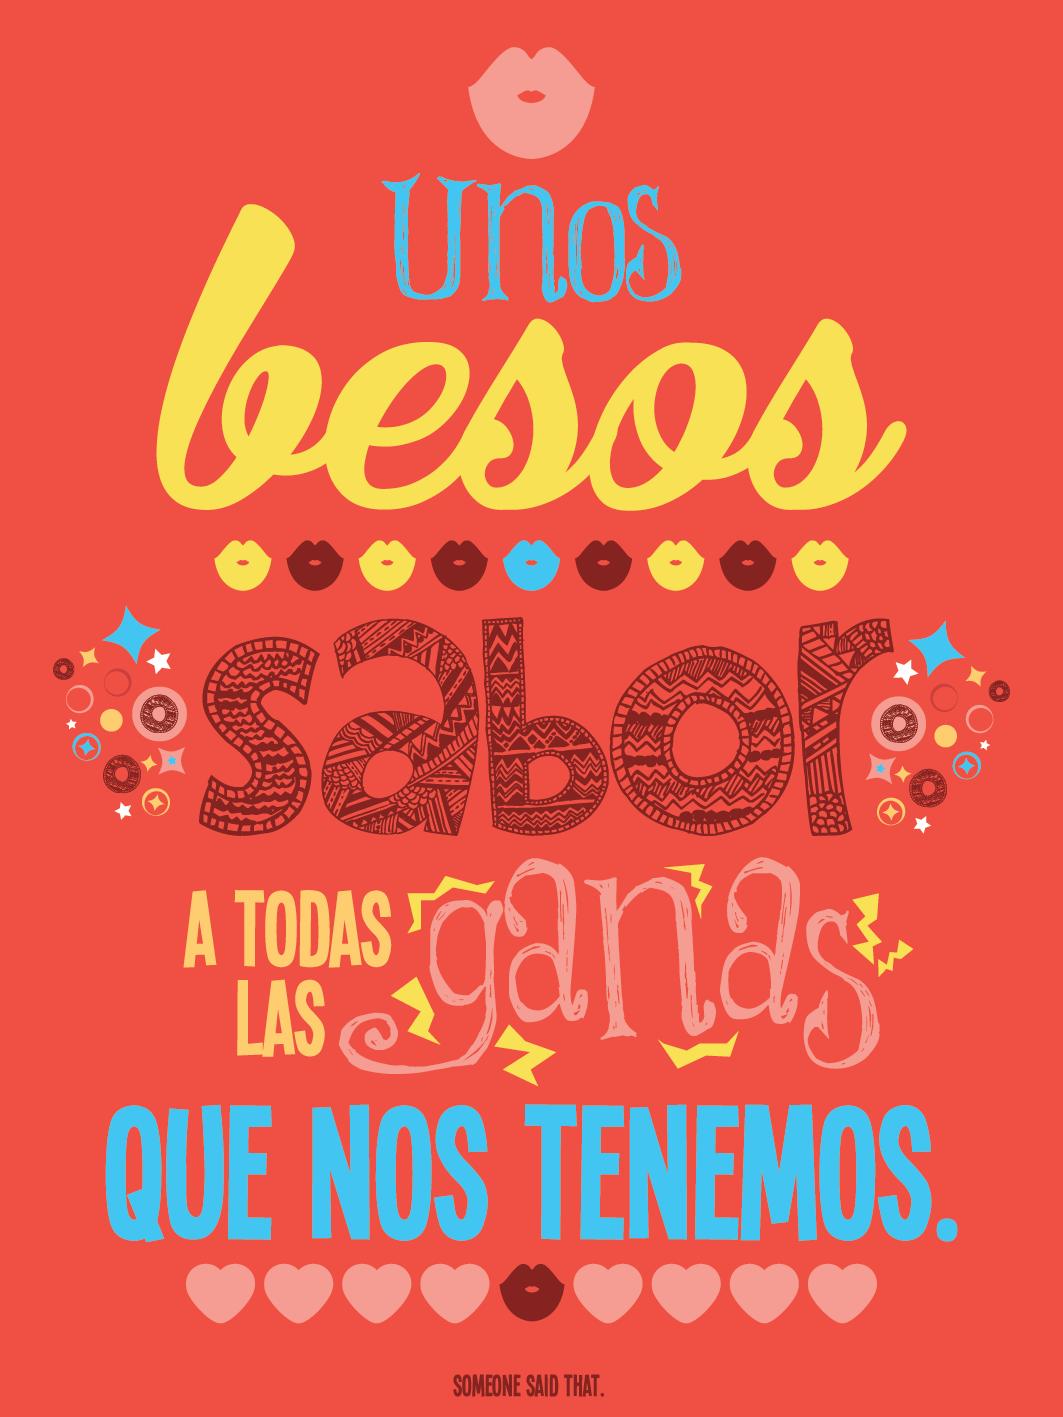 Frases de San Valentín - Frases Bonitas